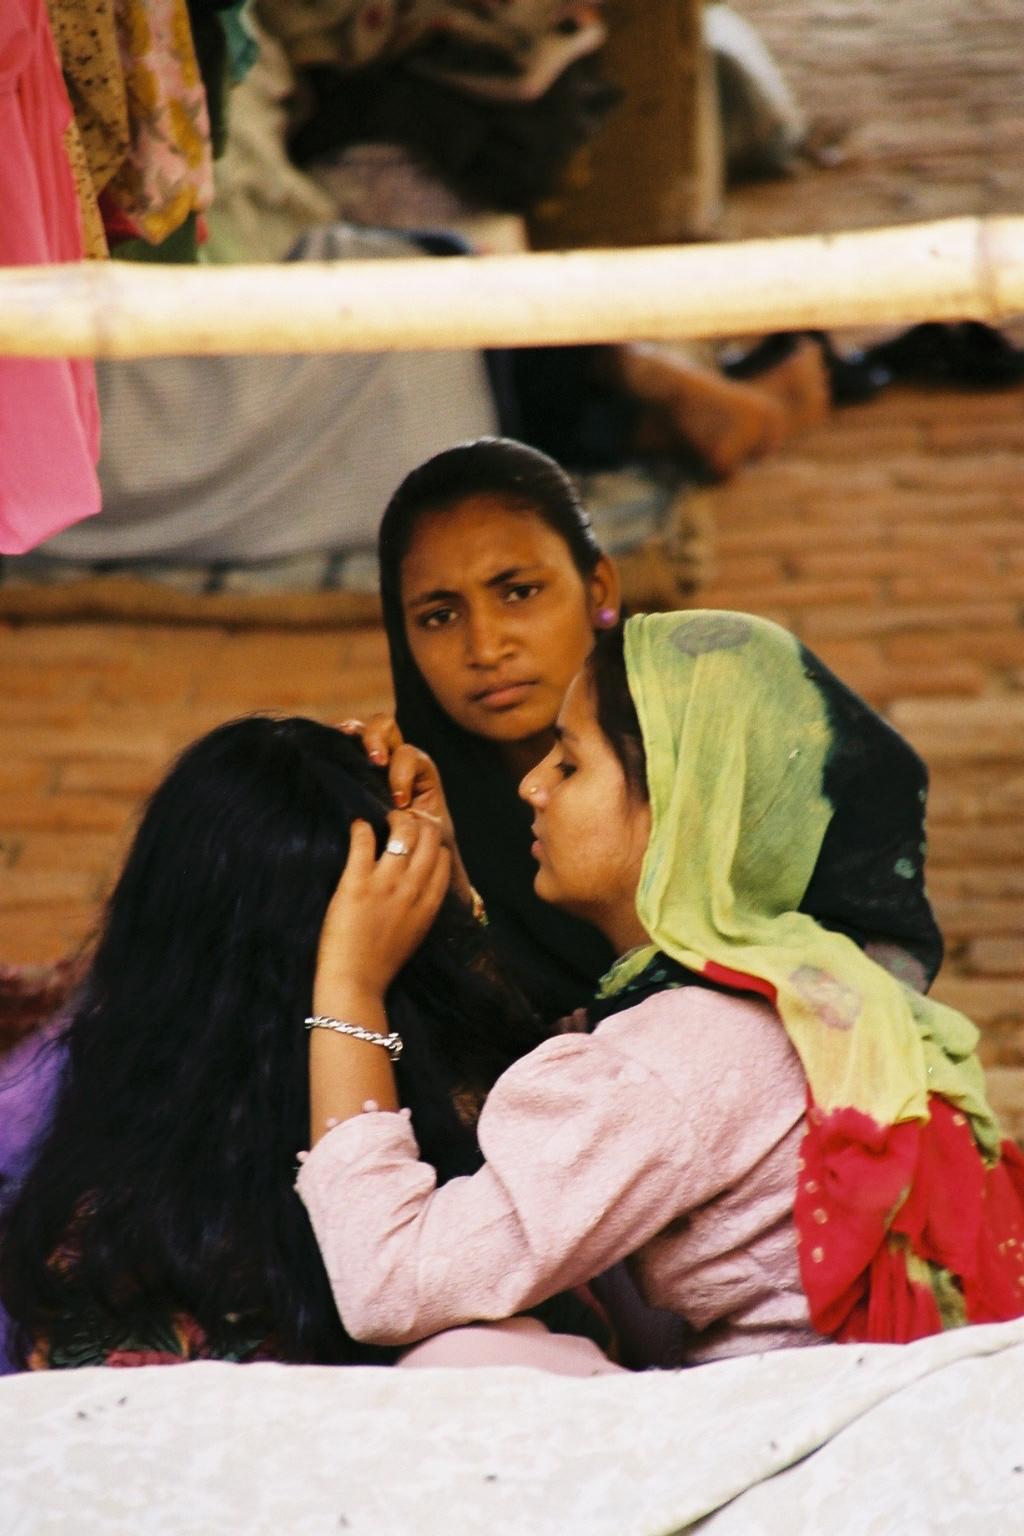 Réfugiées d'origine musulmane